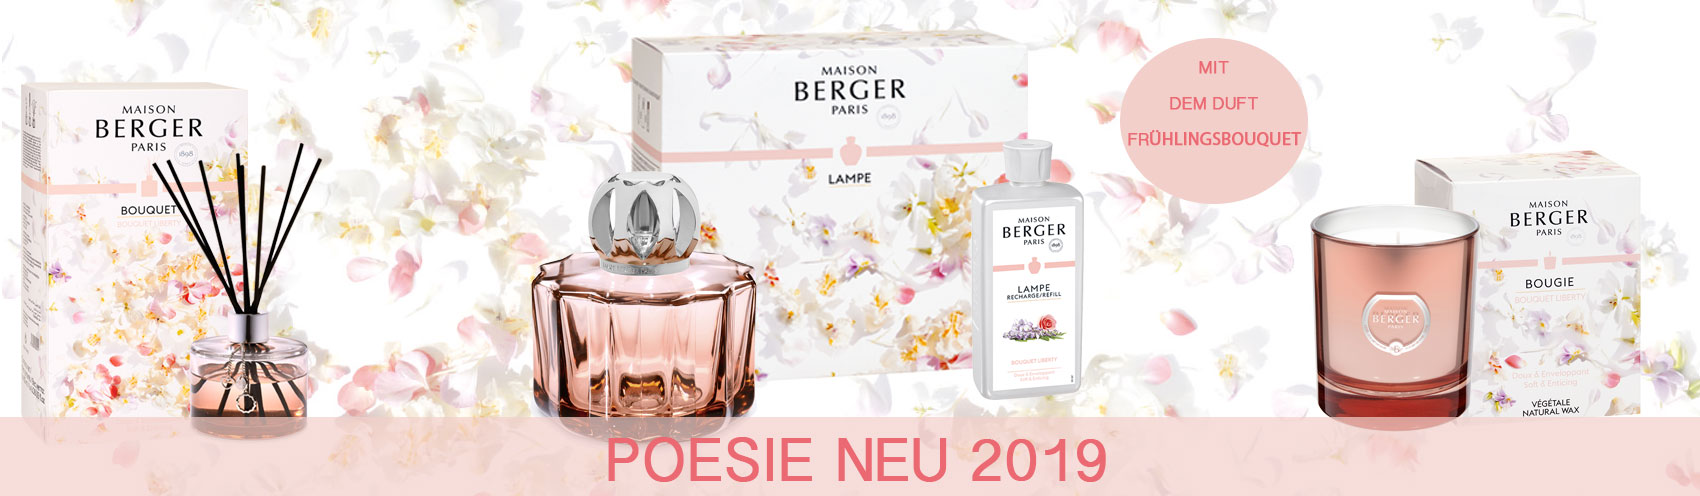 Lampe Berger Neuheiten 2019